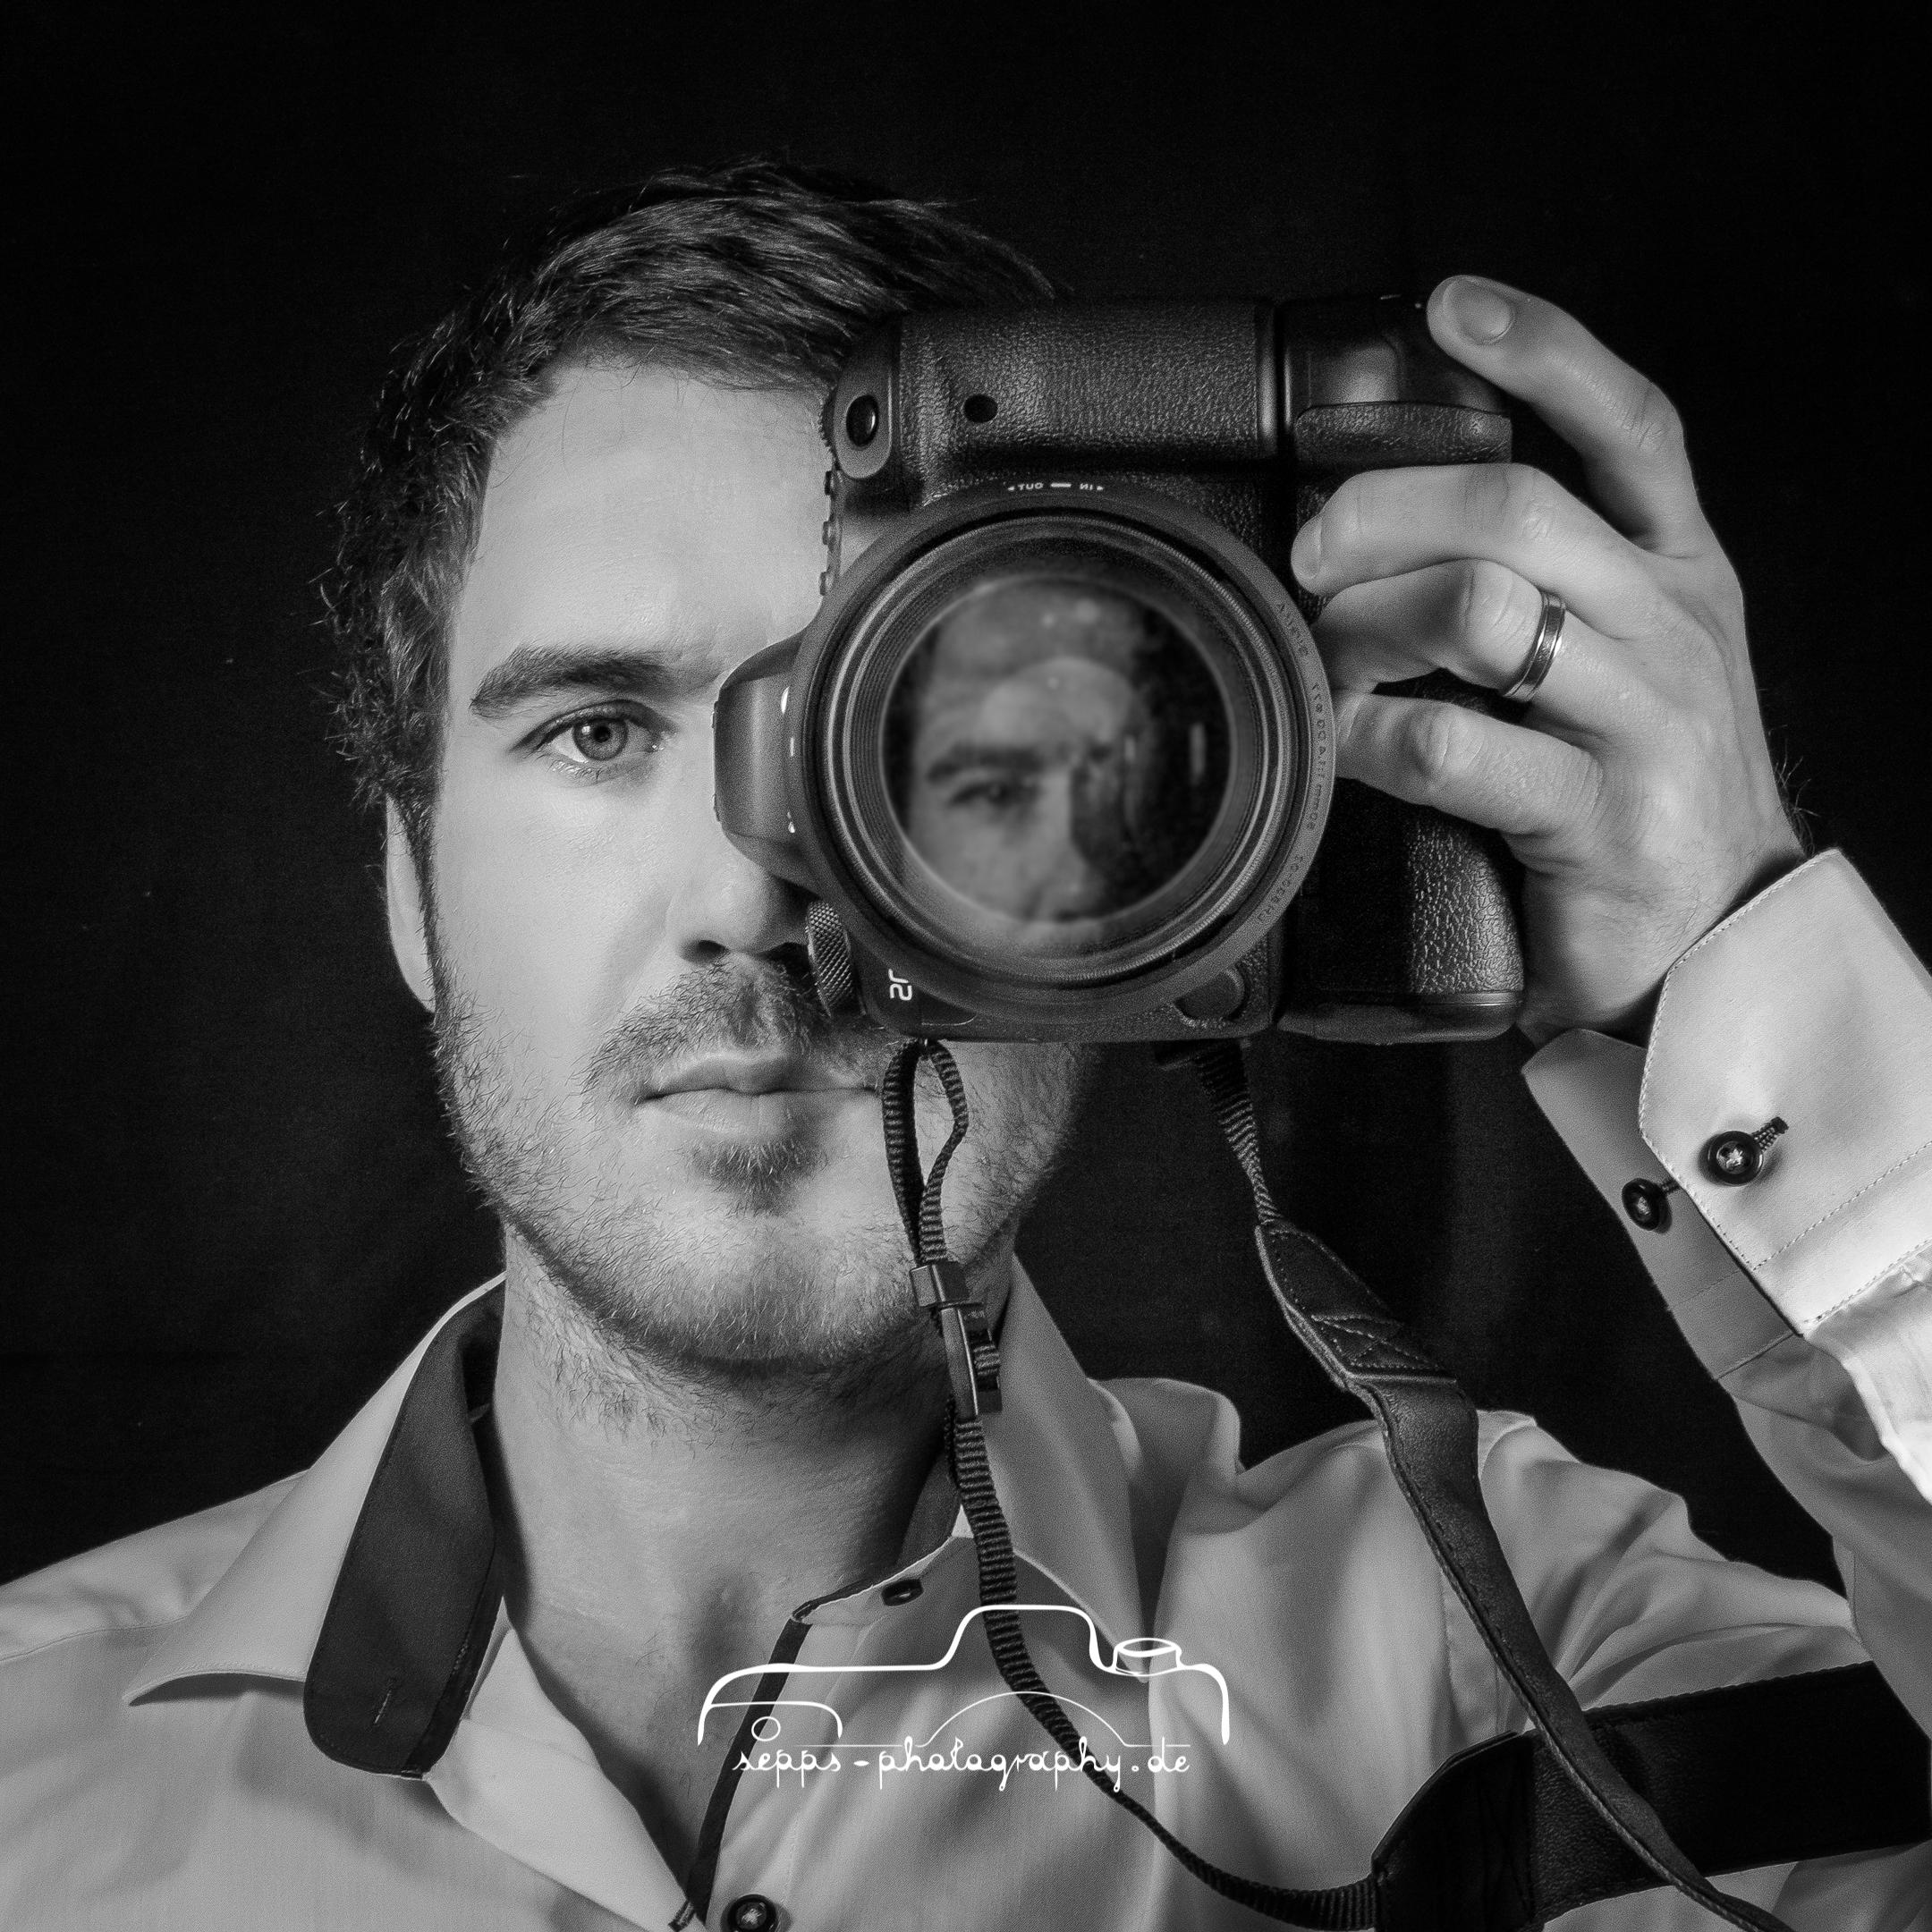 SeppsPhotography & FotoboxBraunschweig